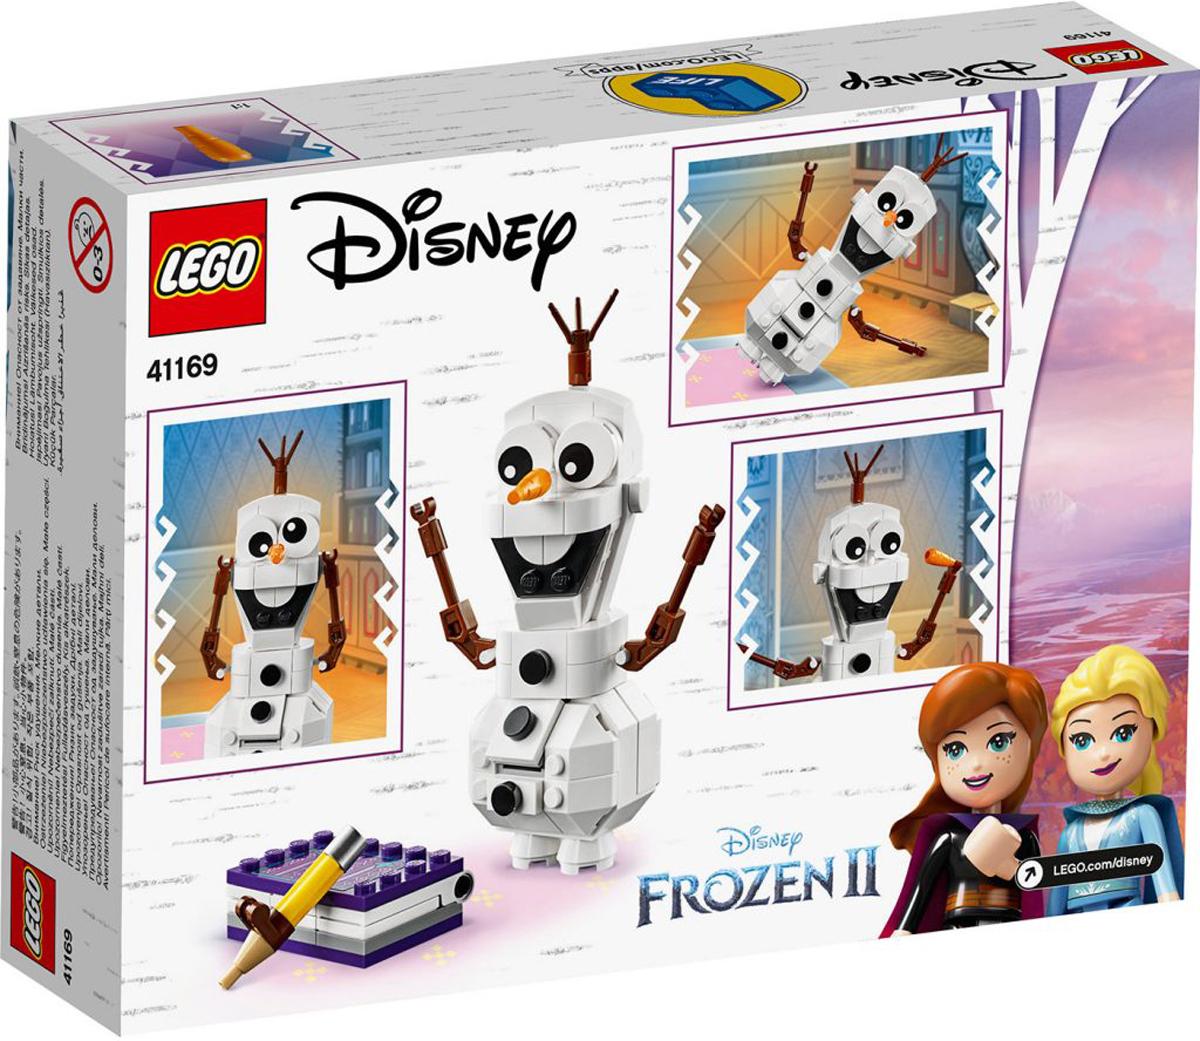 Olaf Brick Headz New Disney Frozen 2 IN-HAND US SELLER LEGO 41169